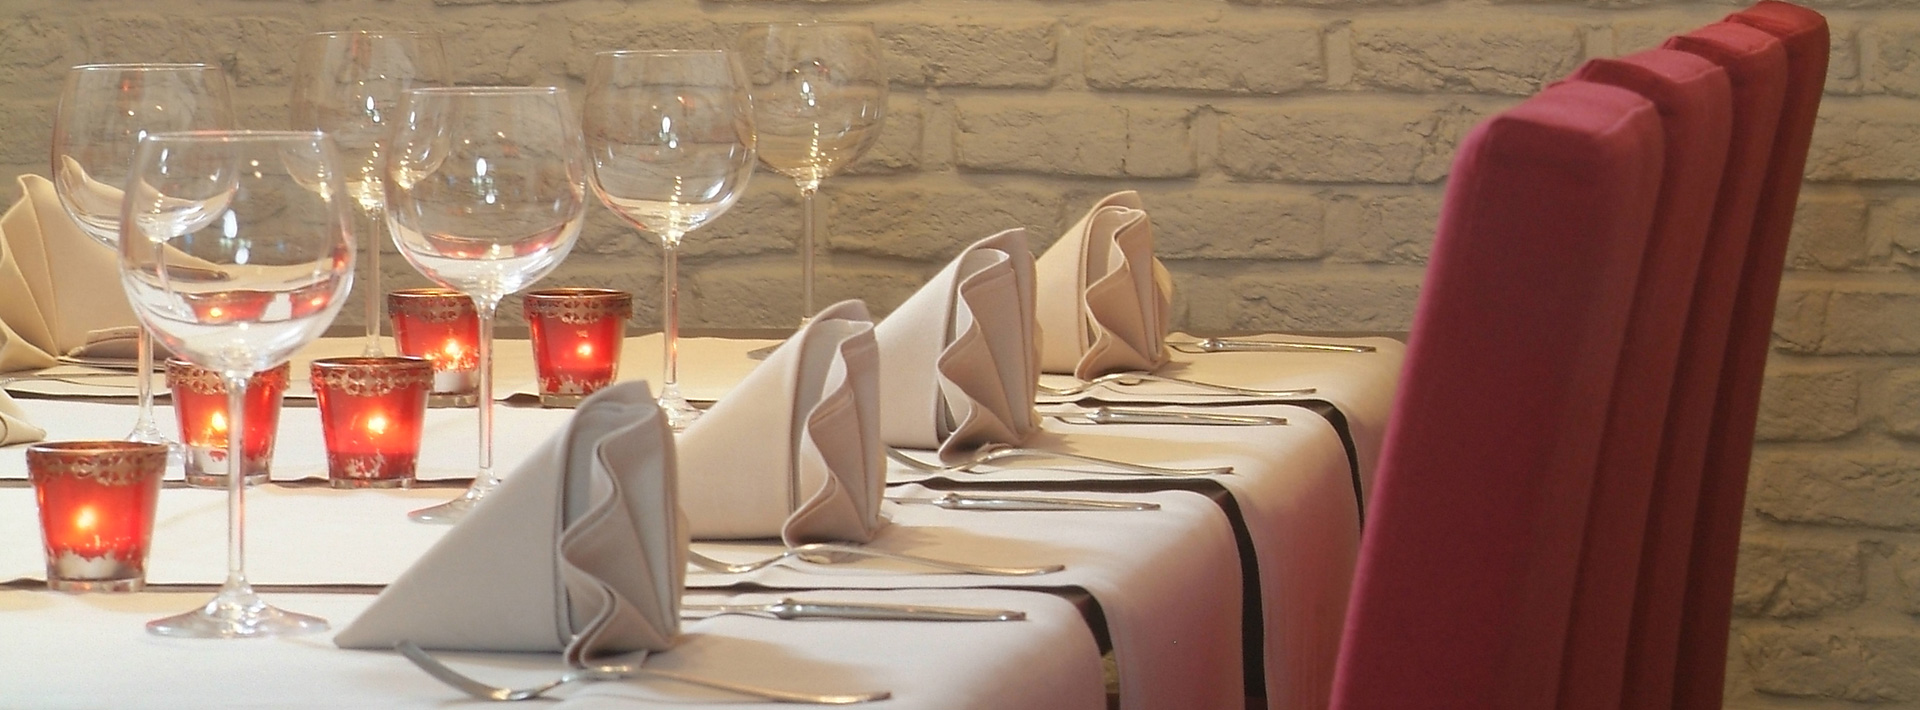 restaurant-malpertus-in-st-niklaas_DSCF2545